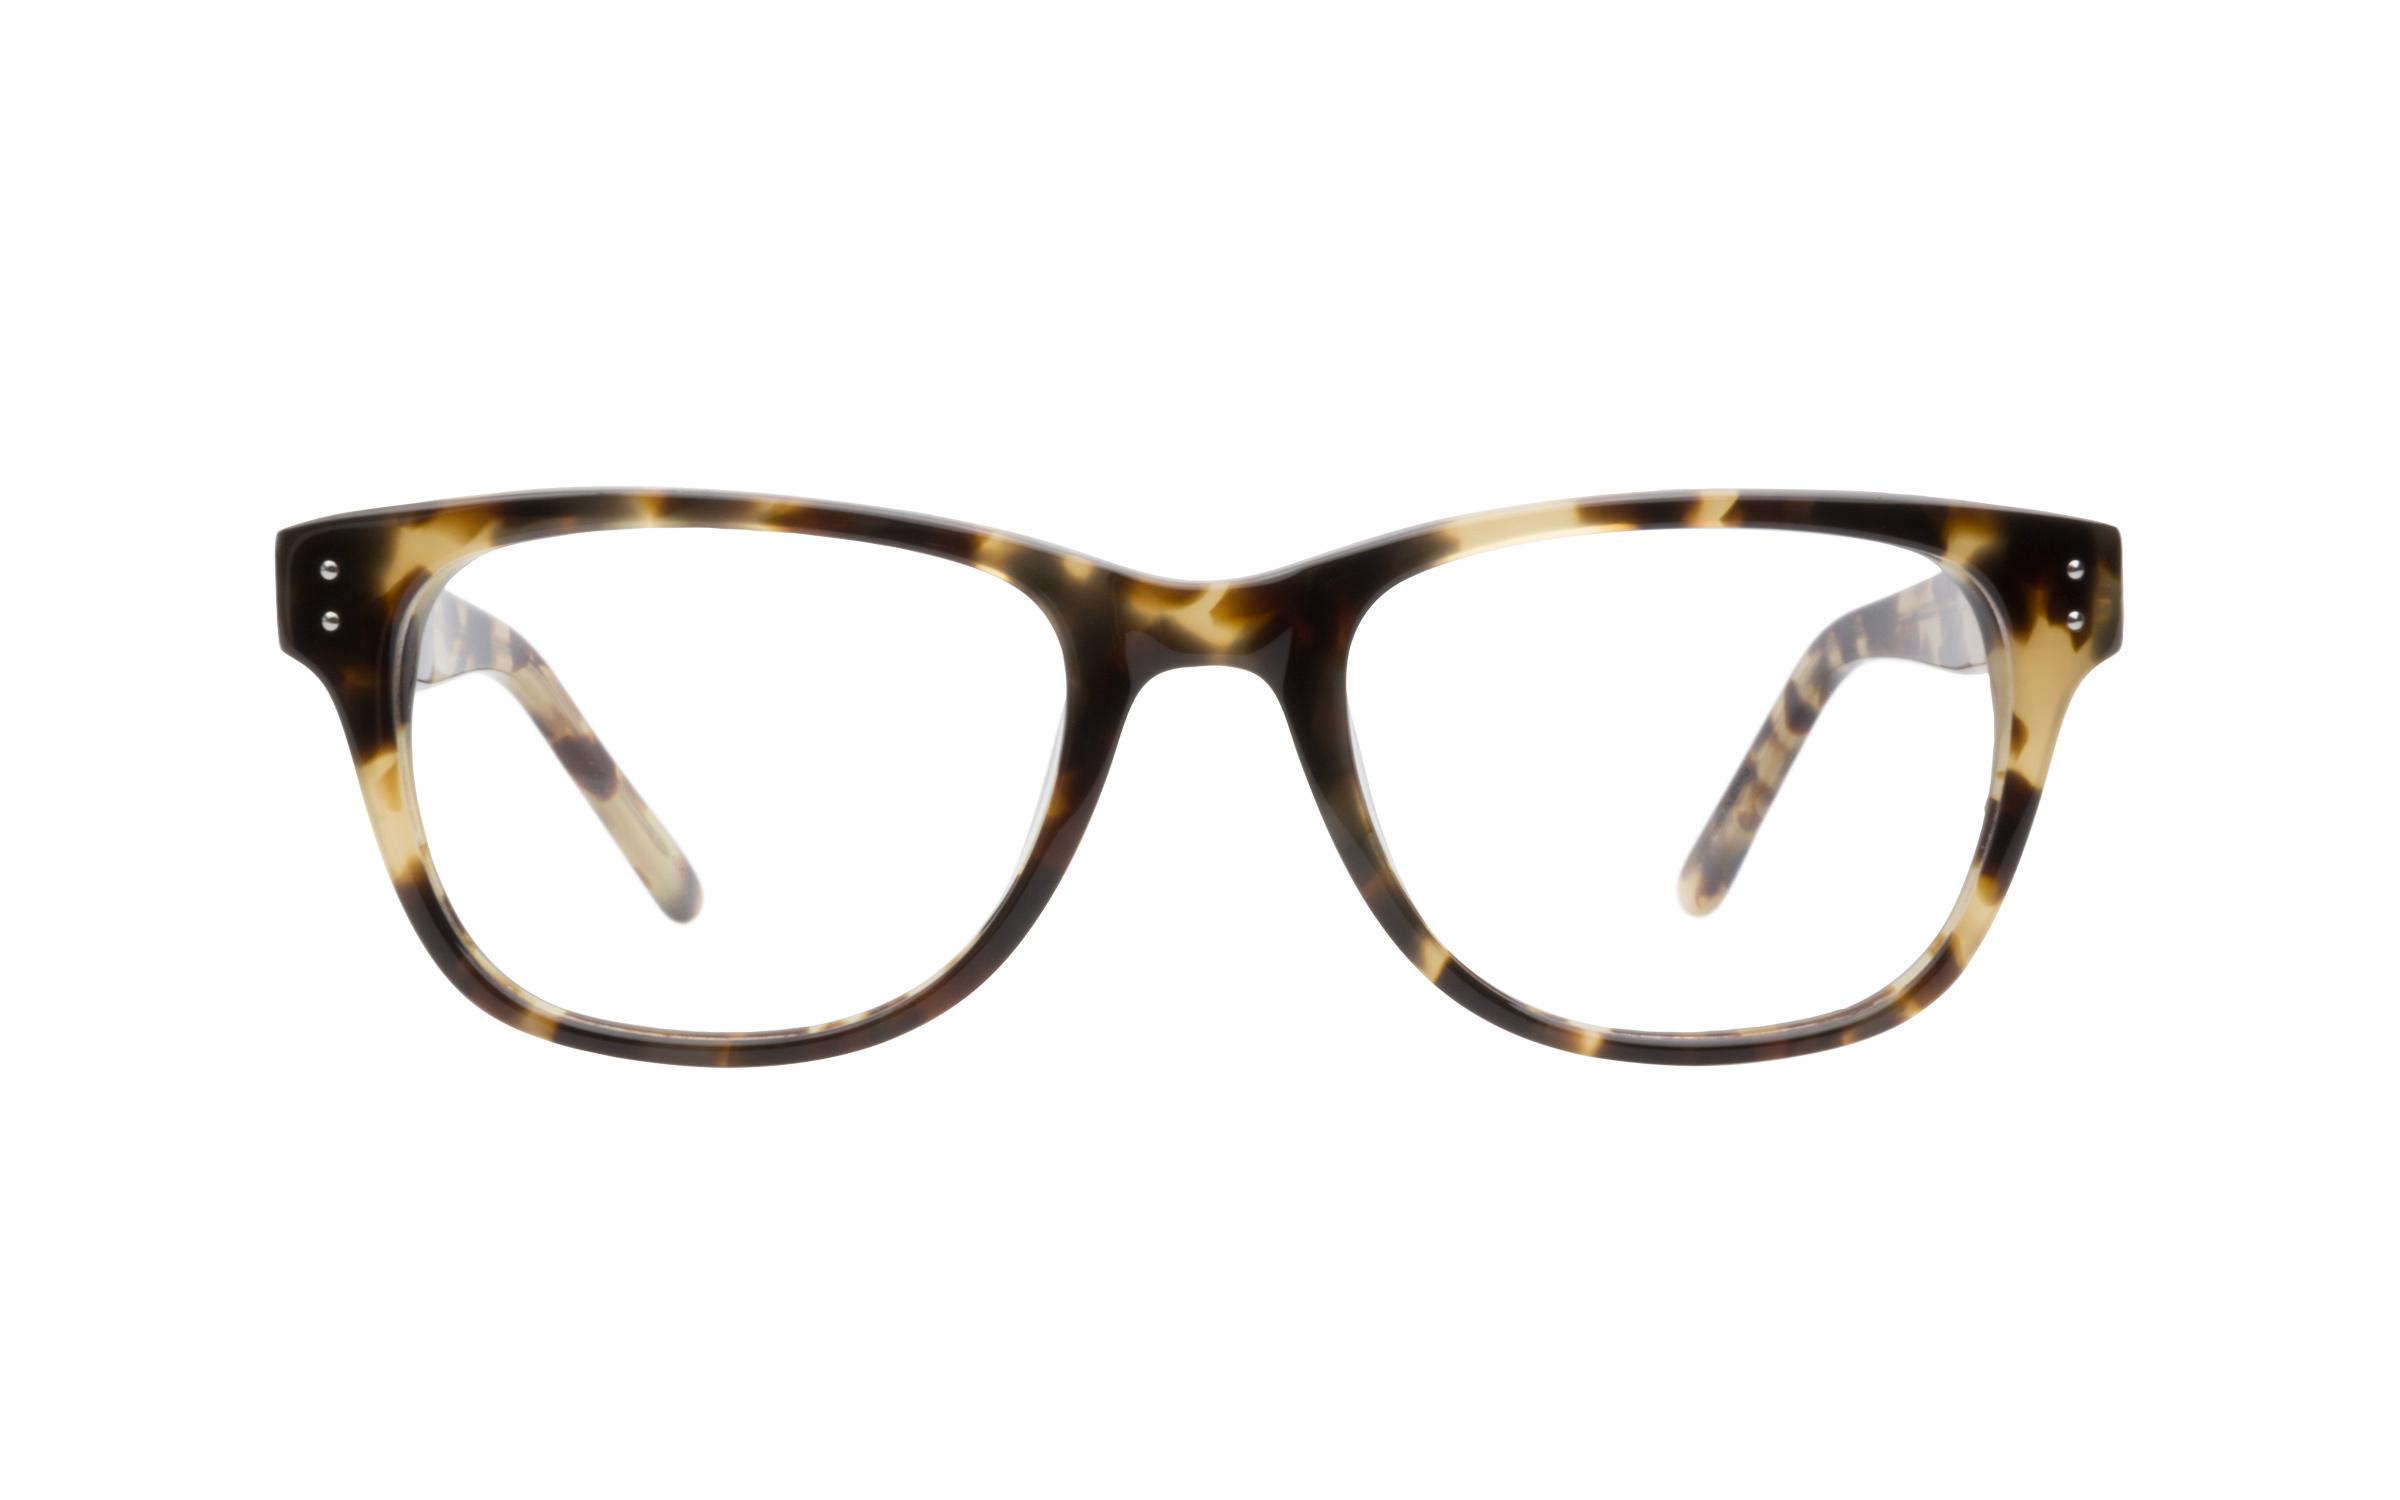 Womens_Tokyo_Tortoise_Retro_Love_Glasses__Clearly_Glasses_Online